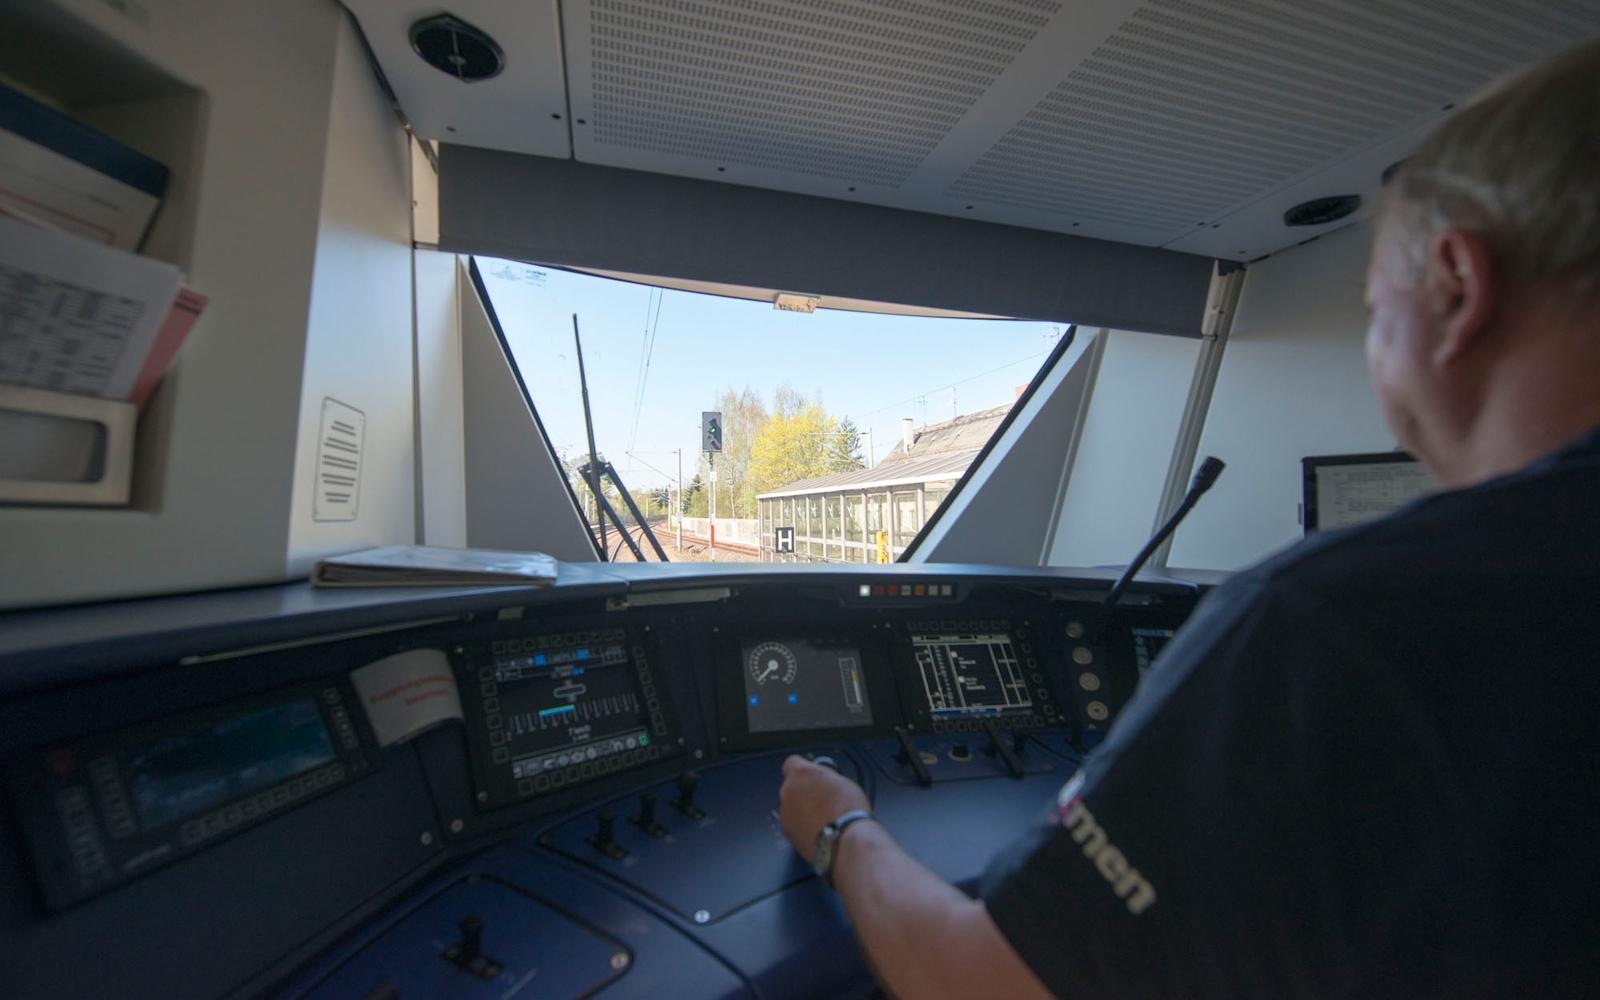 © Foto: Susann Wentzlaff | railmen TF Ralf Gruschinske